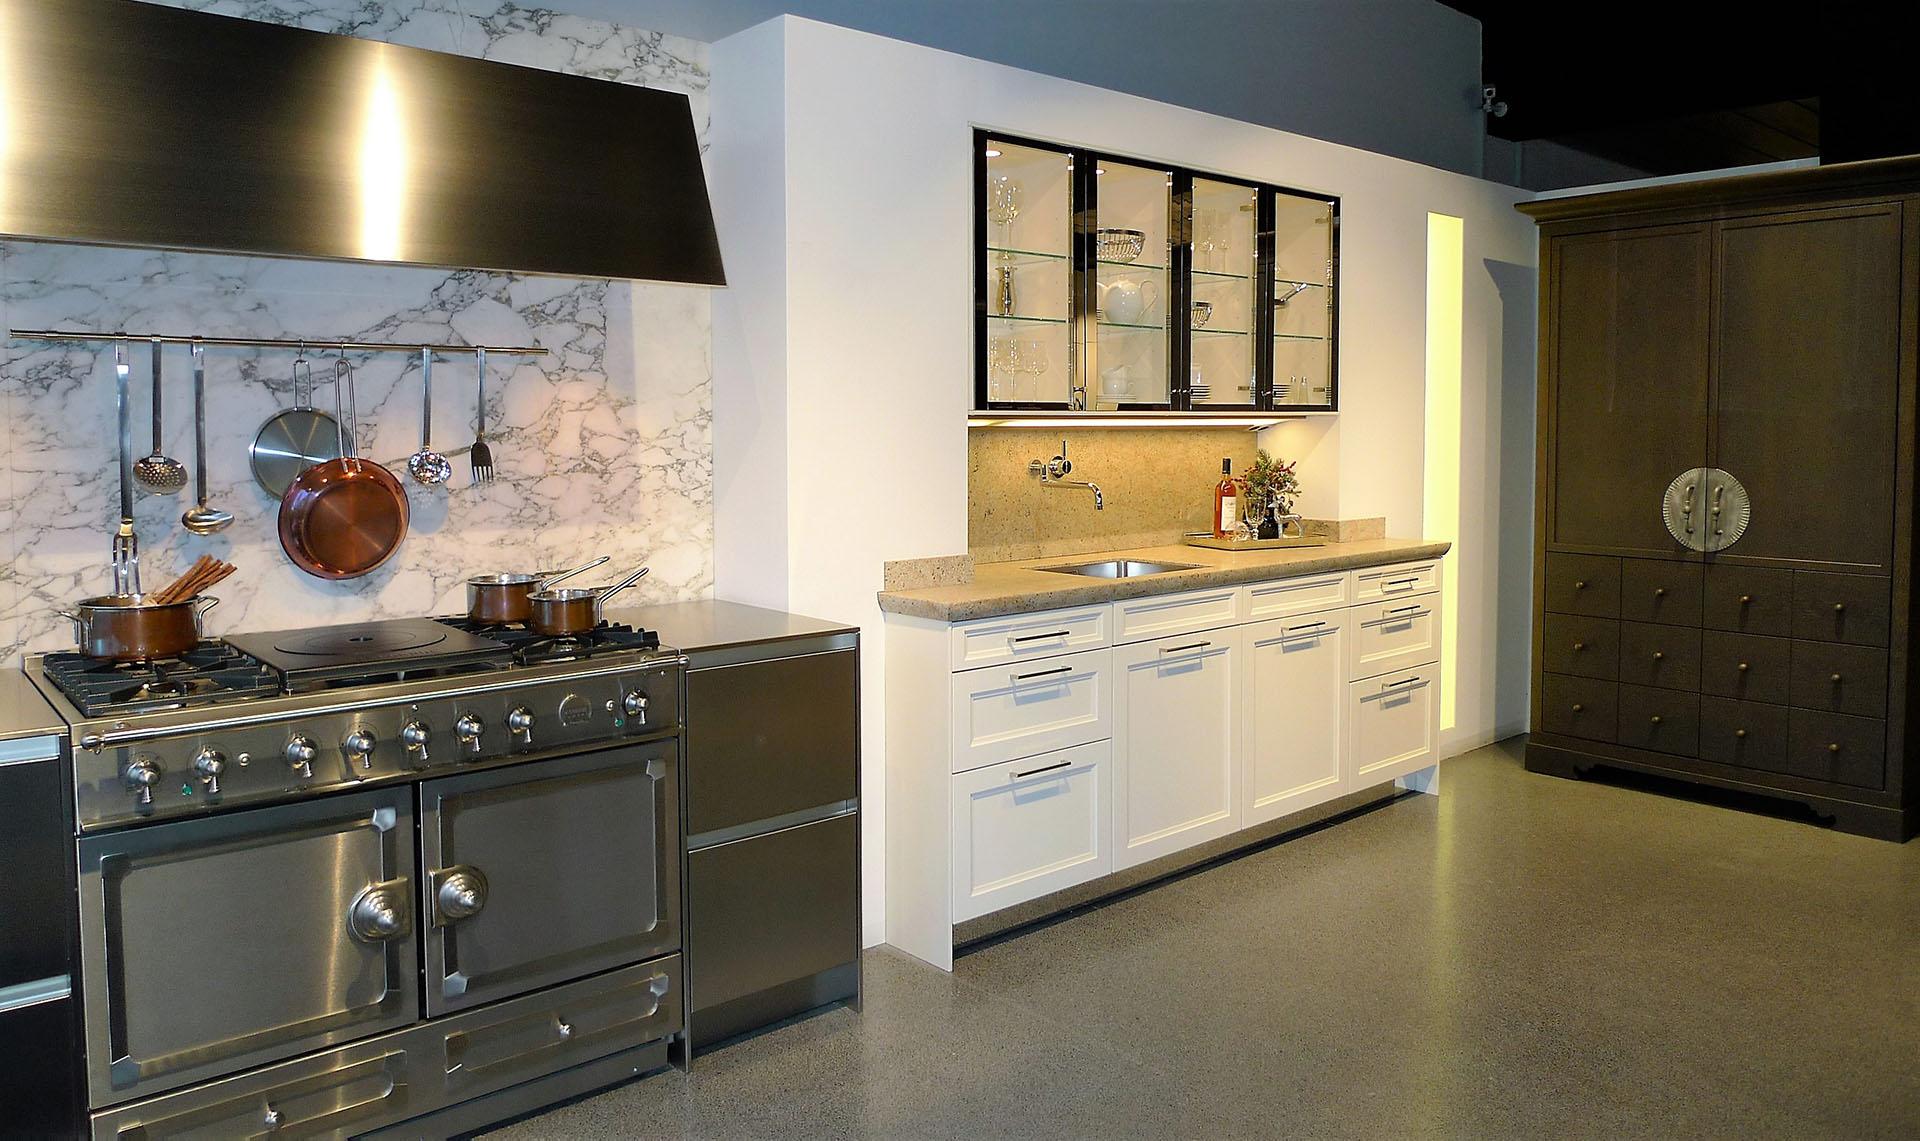 abverkauf siematic musterk che. Black Bedroom Furniture Sets. Home Design Ideas